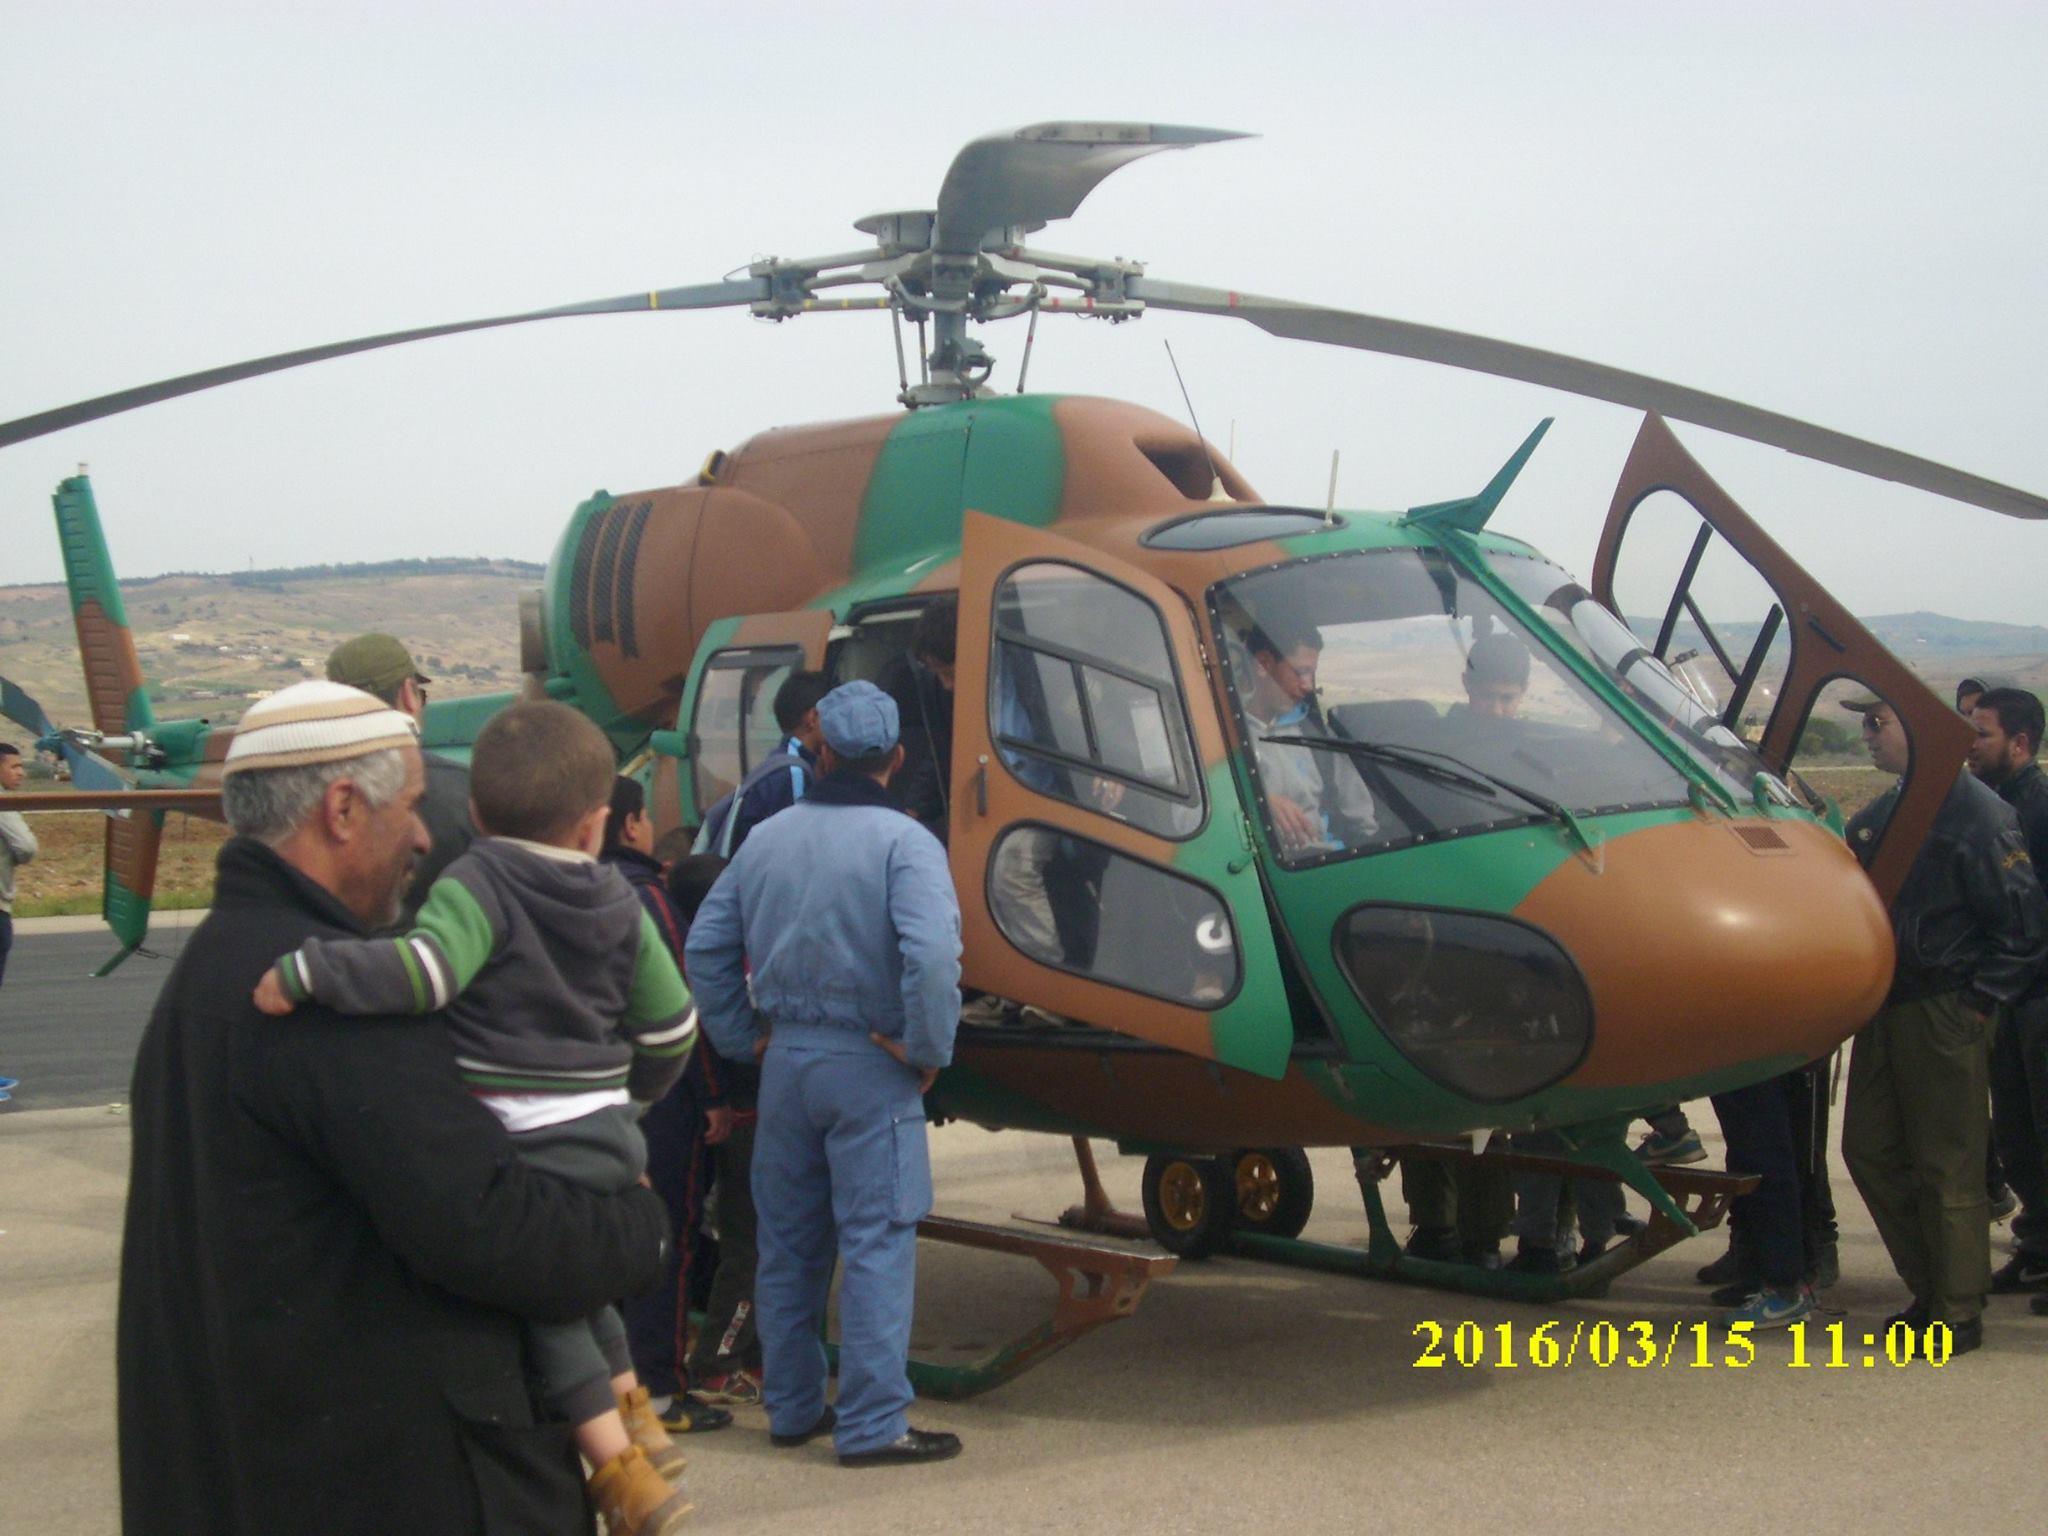 صور مروحيات القوات الجوية الجزائرية Ecureuil/Fennec ] AS-355N2 / AS-555N ] 25276081063_1c32a62f76_o